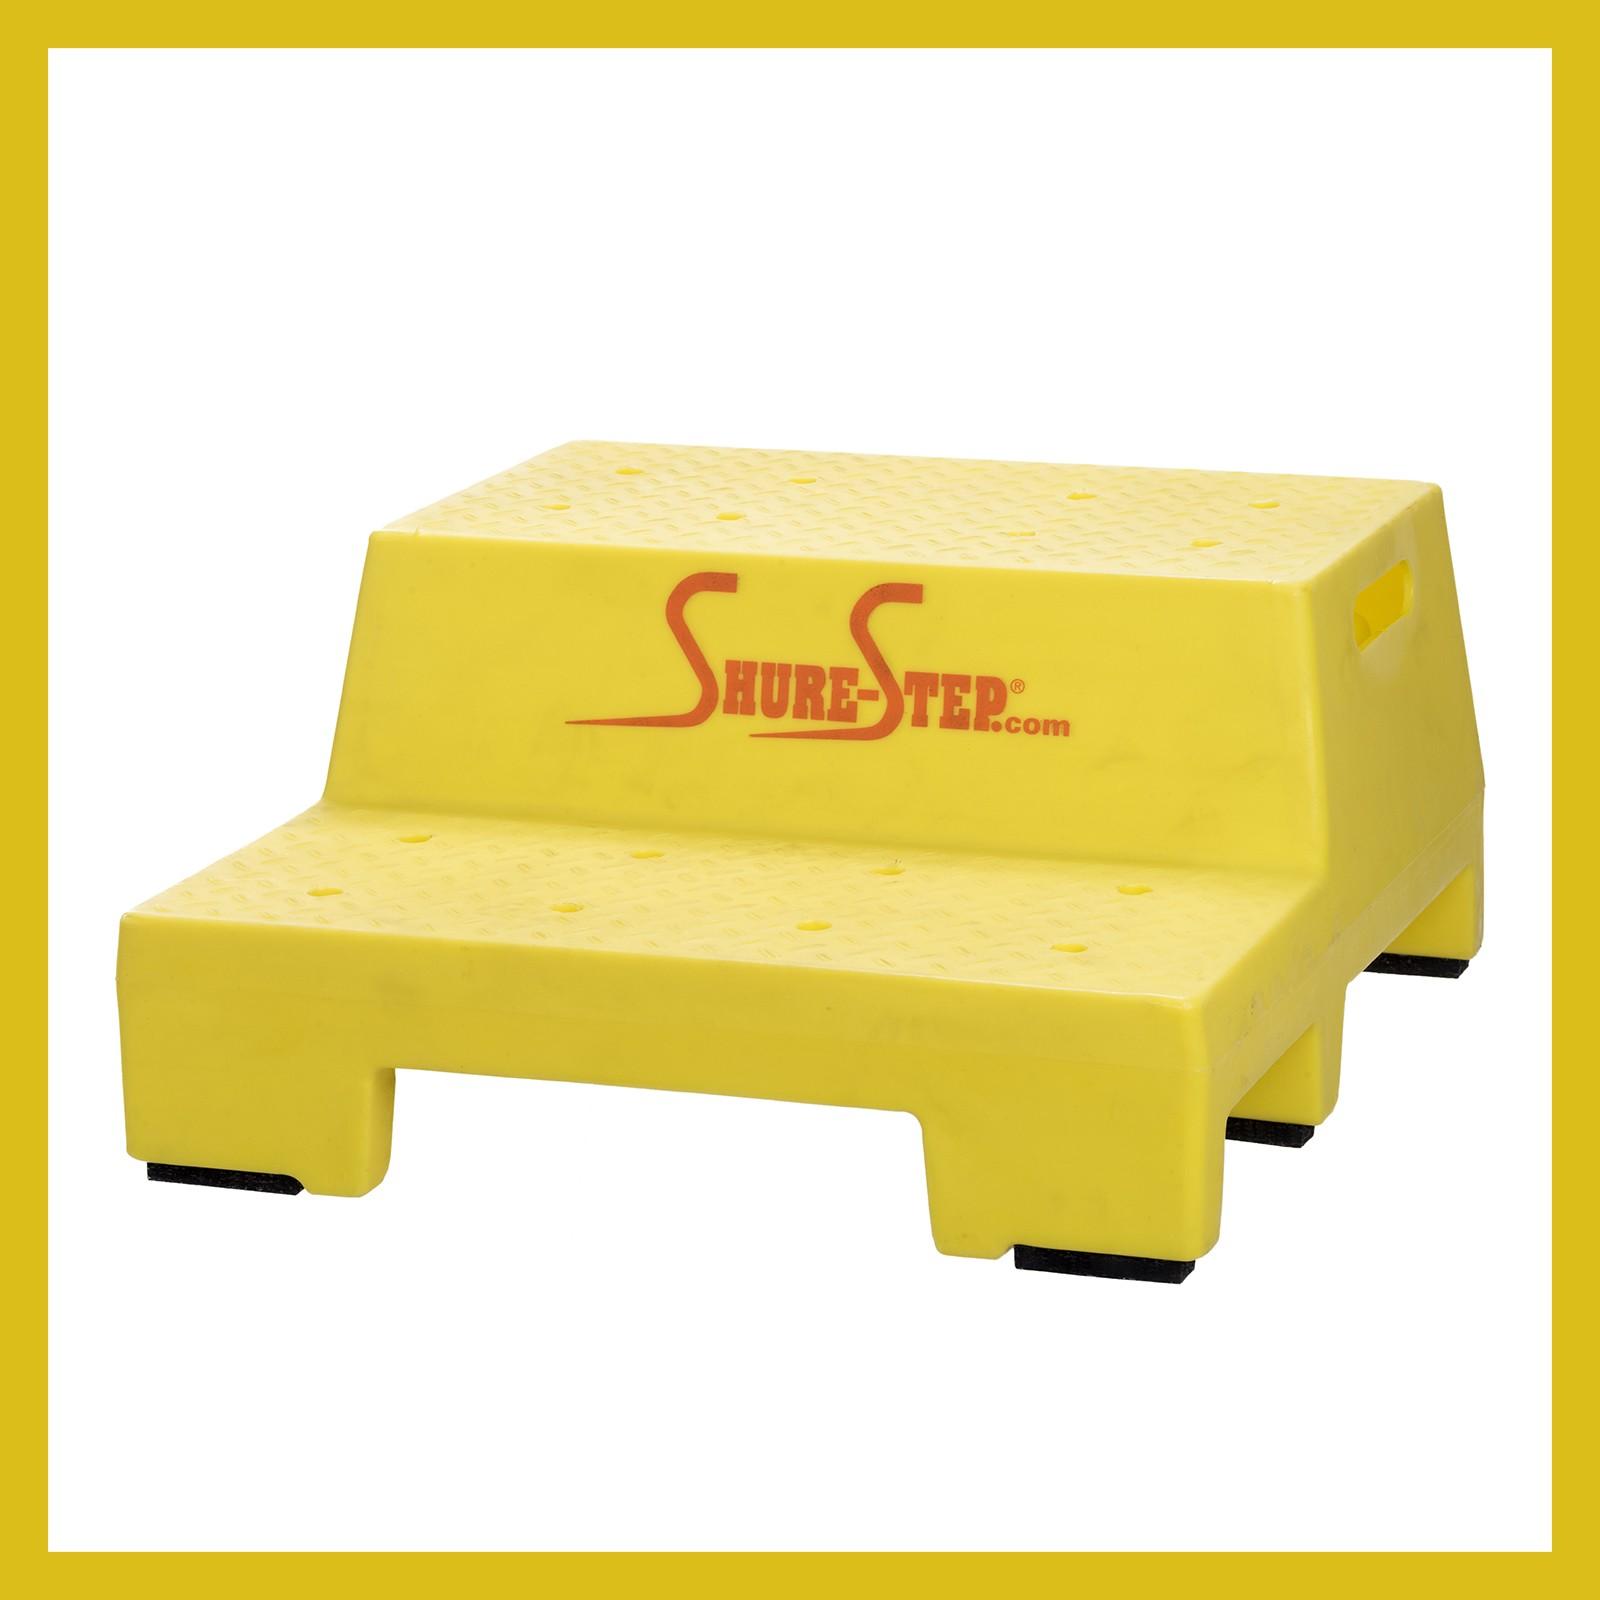 Shure Step Safe Step Stools Step Stool Non Slip